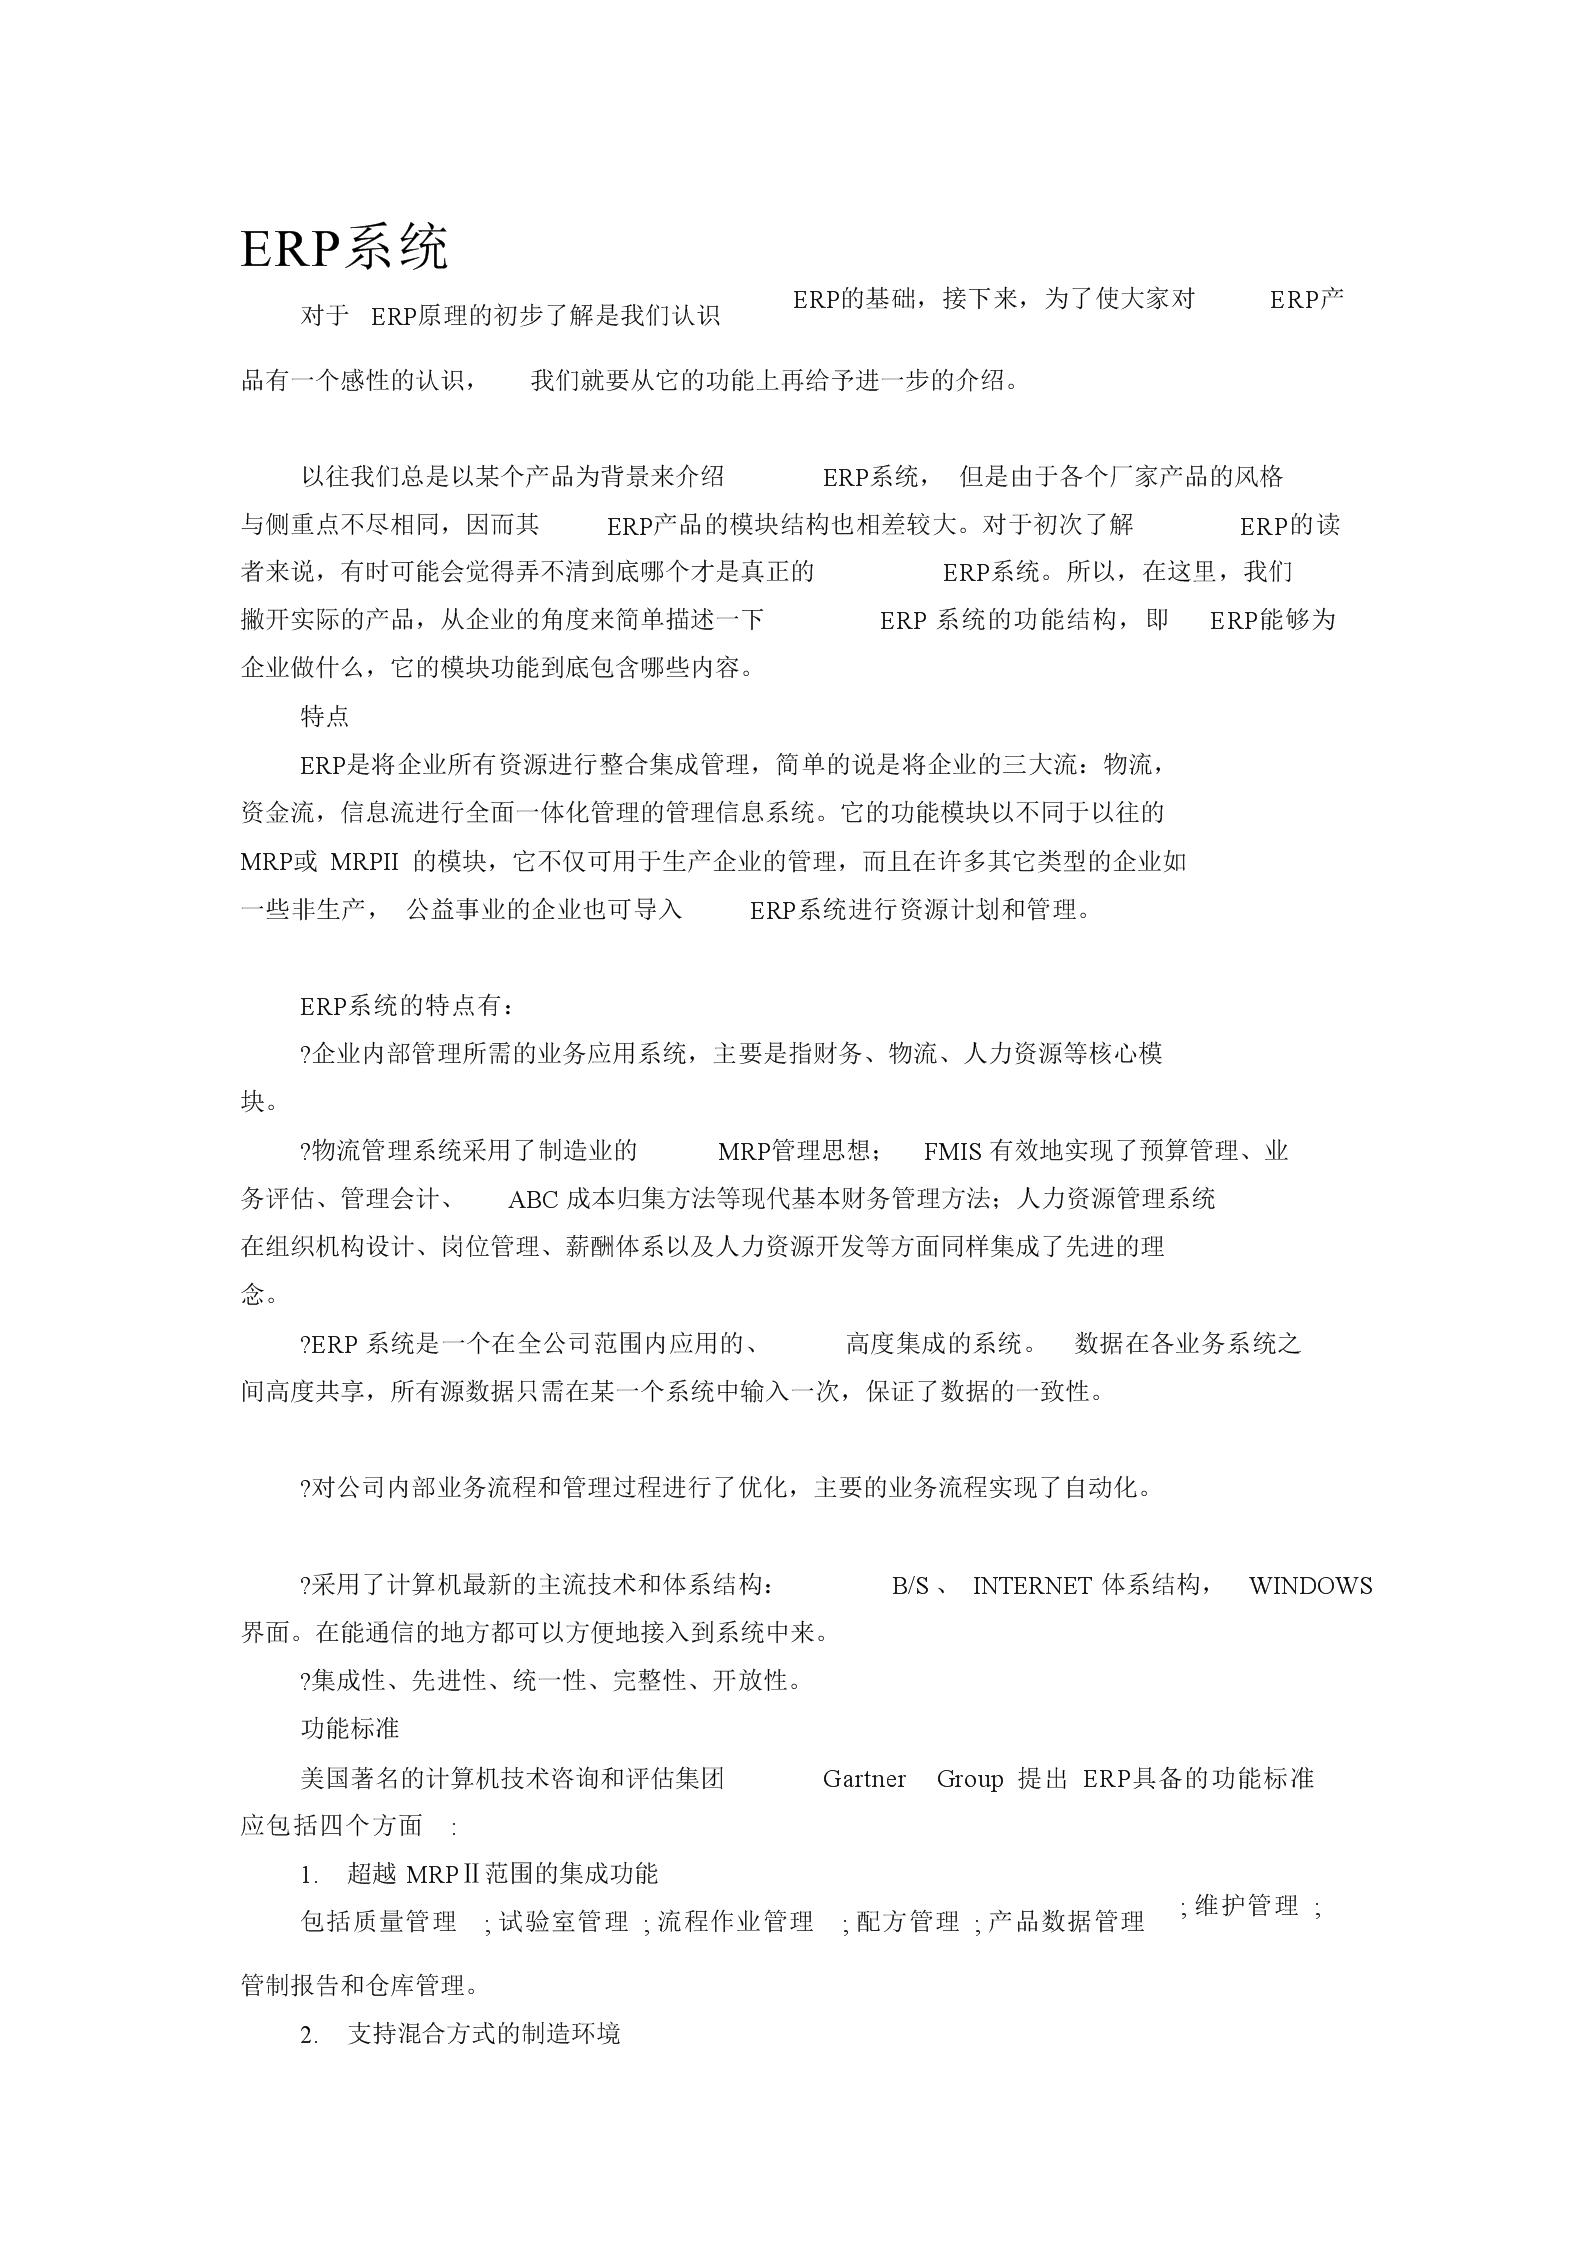 erp系统培训资料(非常全面).docx